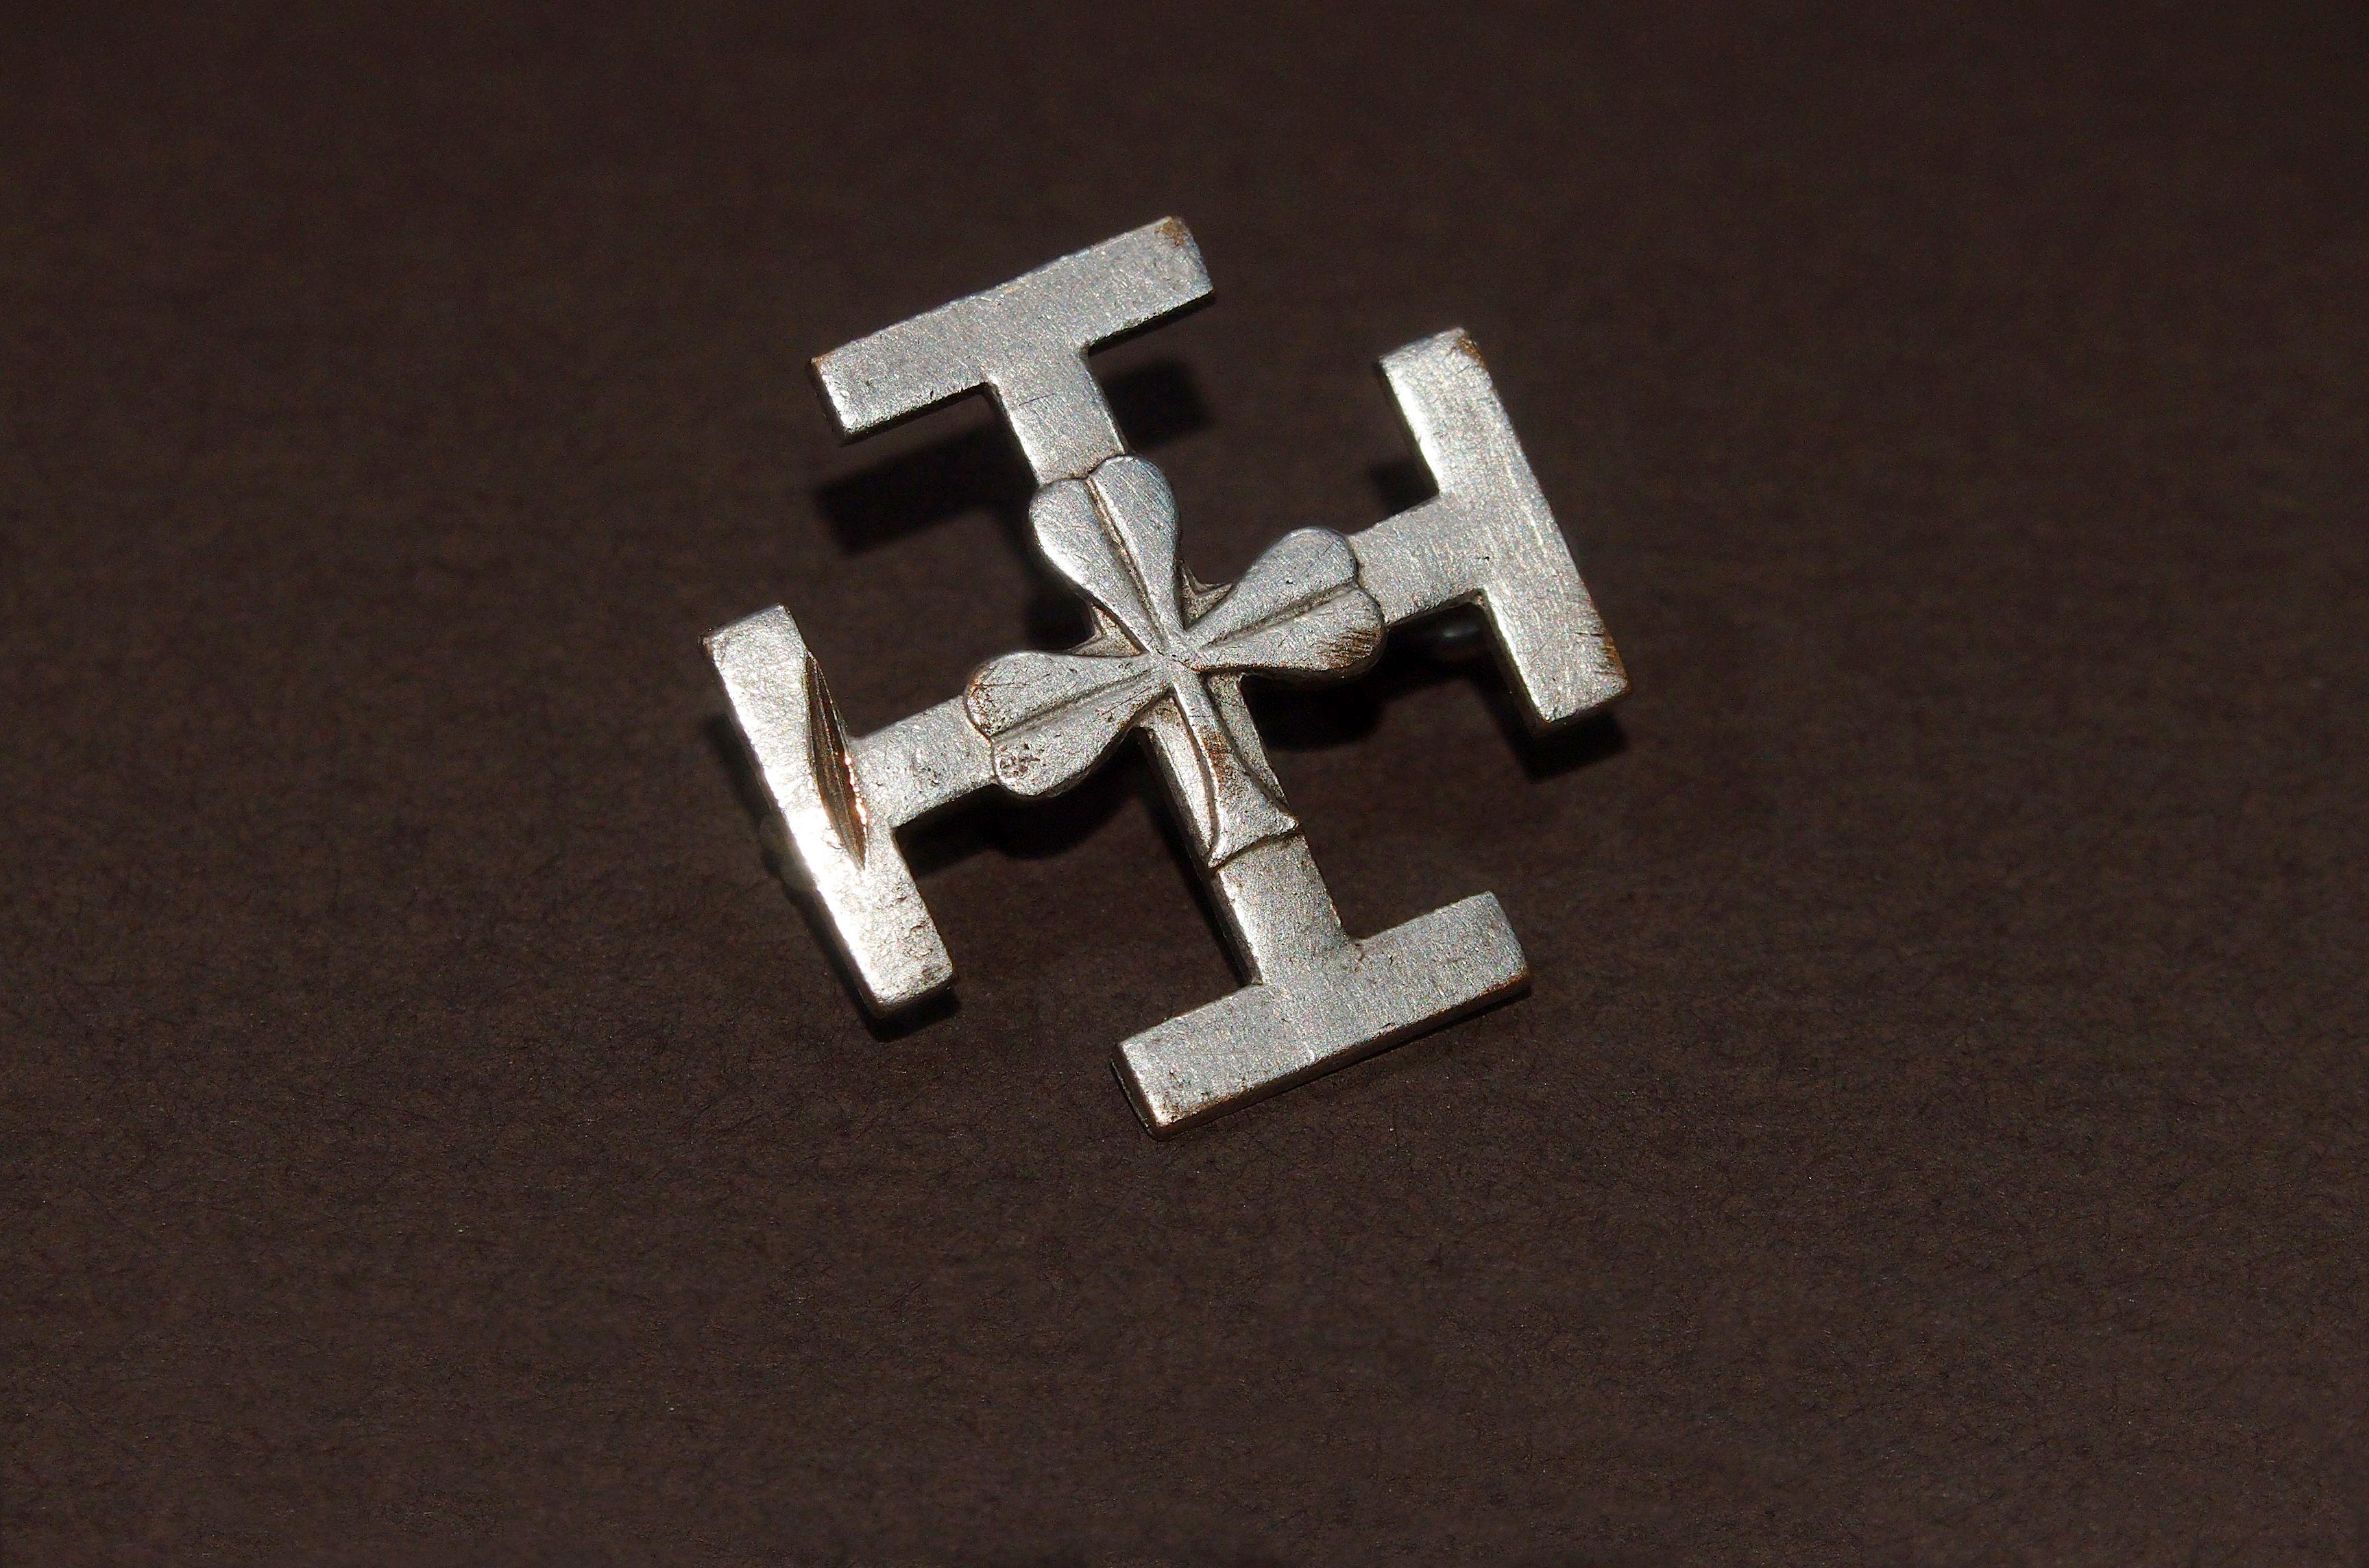 Wooden Cross On A Lace Деревянный Крест На Шнурке